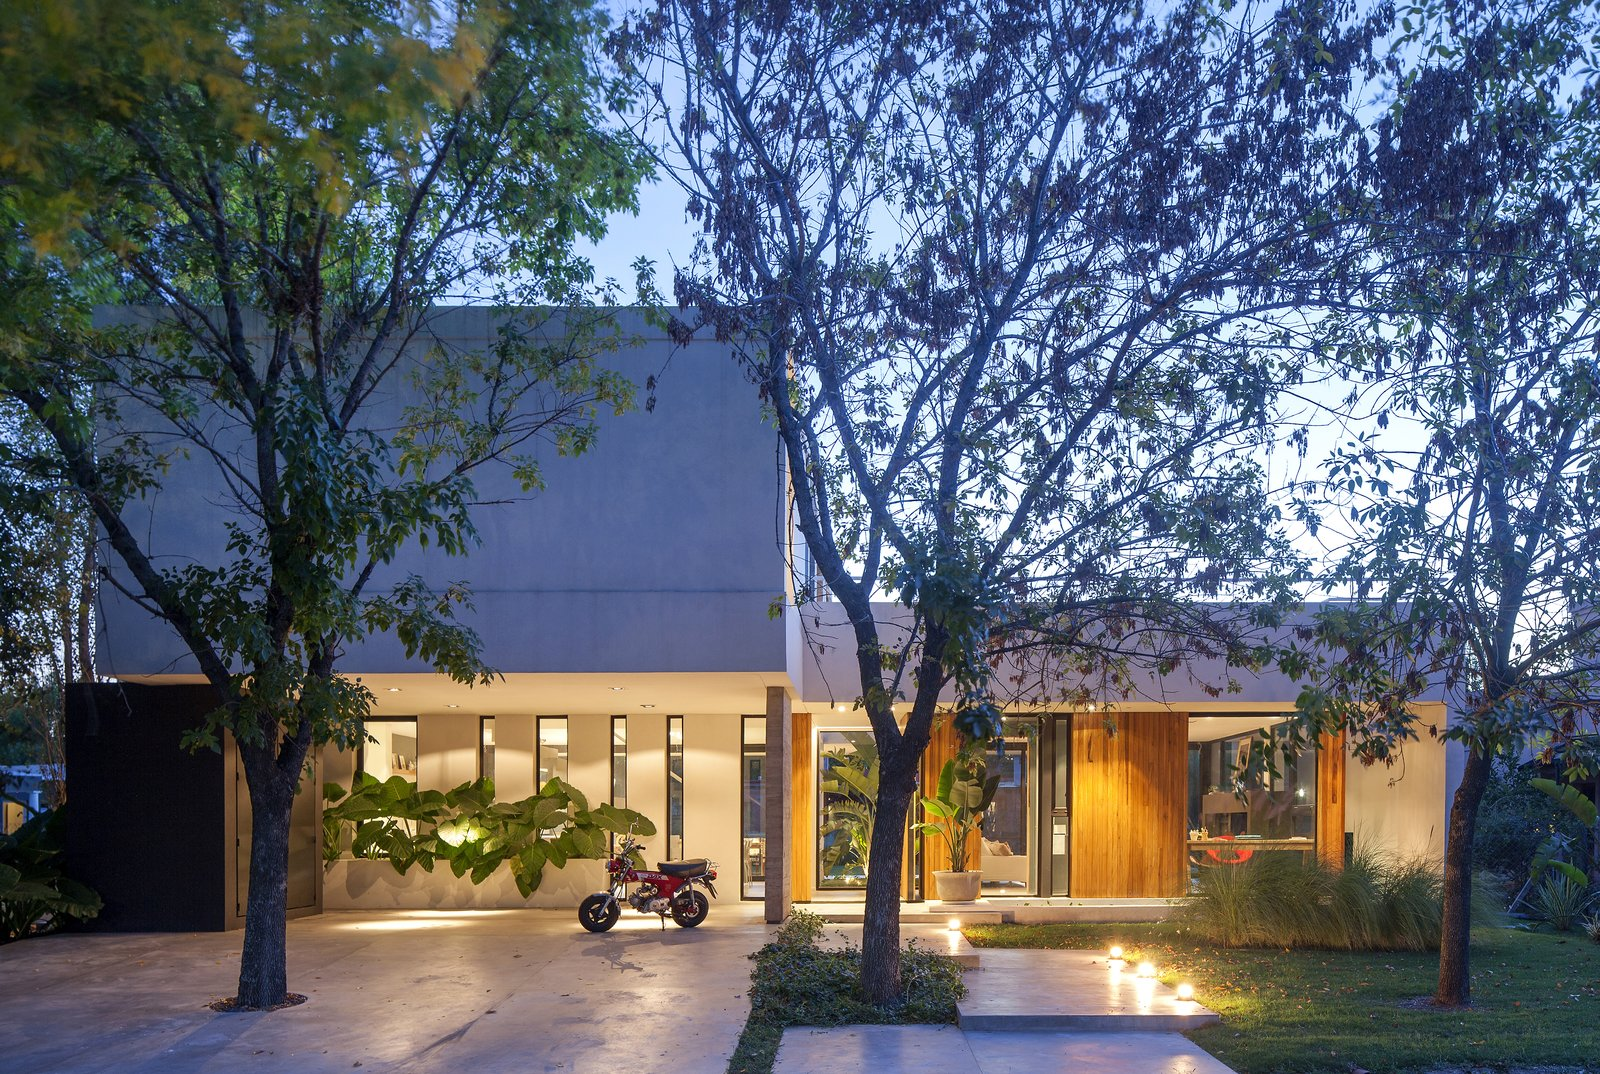 Casa Tana